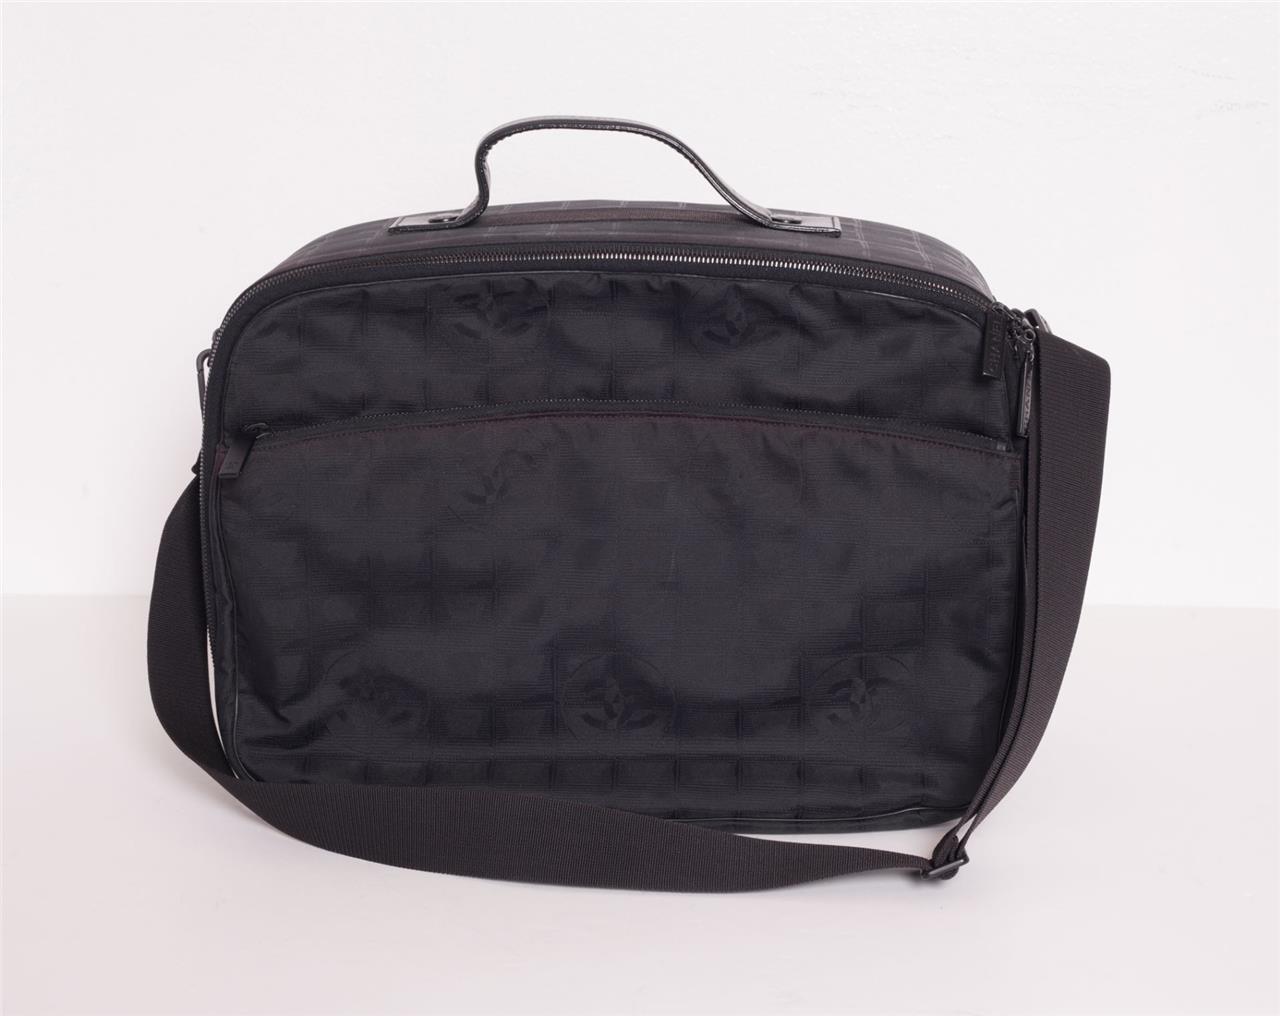 3b85f7b440f5 CHANEL Black Canvas MONOGRAM CC LOGO Overnight Carry-On Case Luggage ...